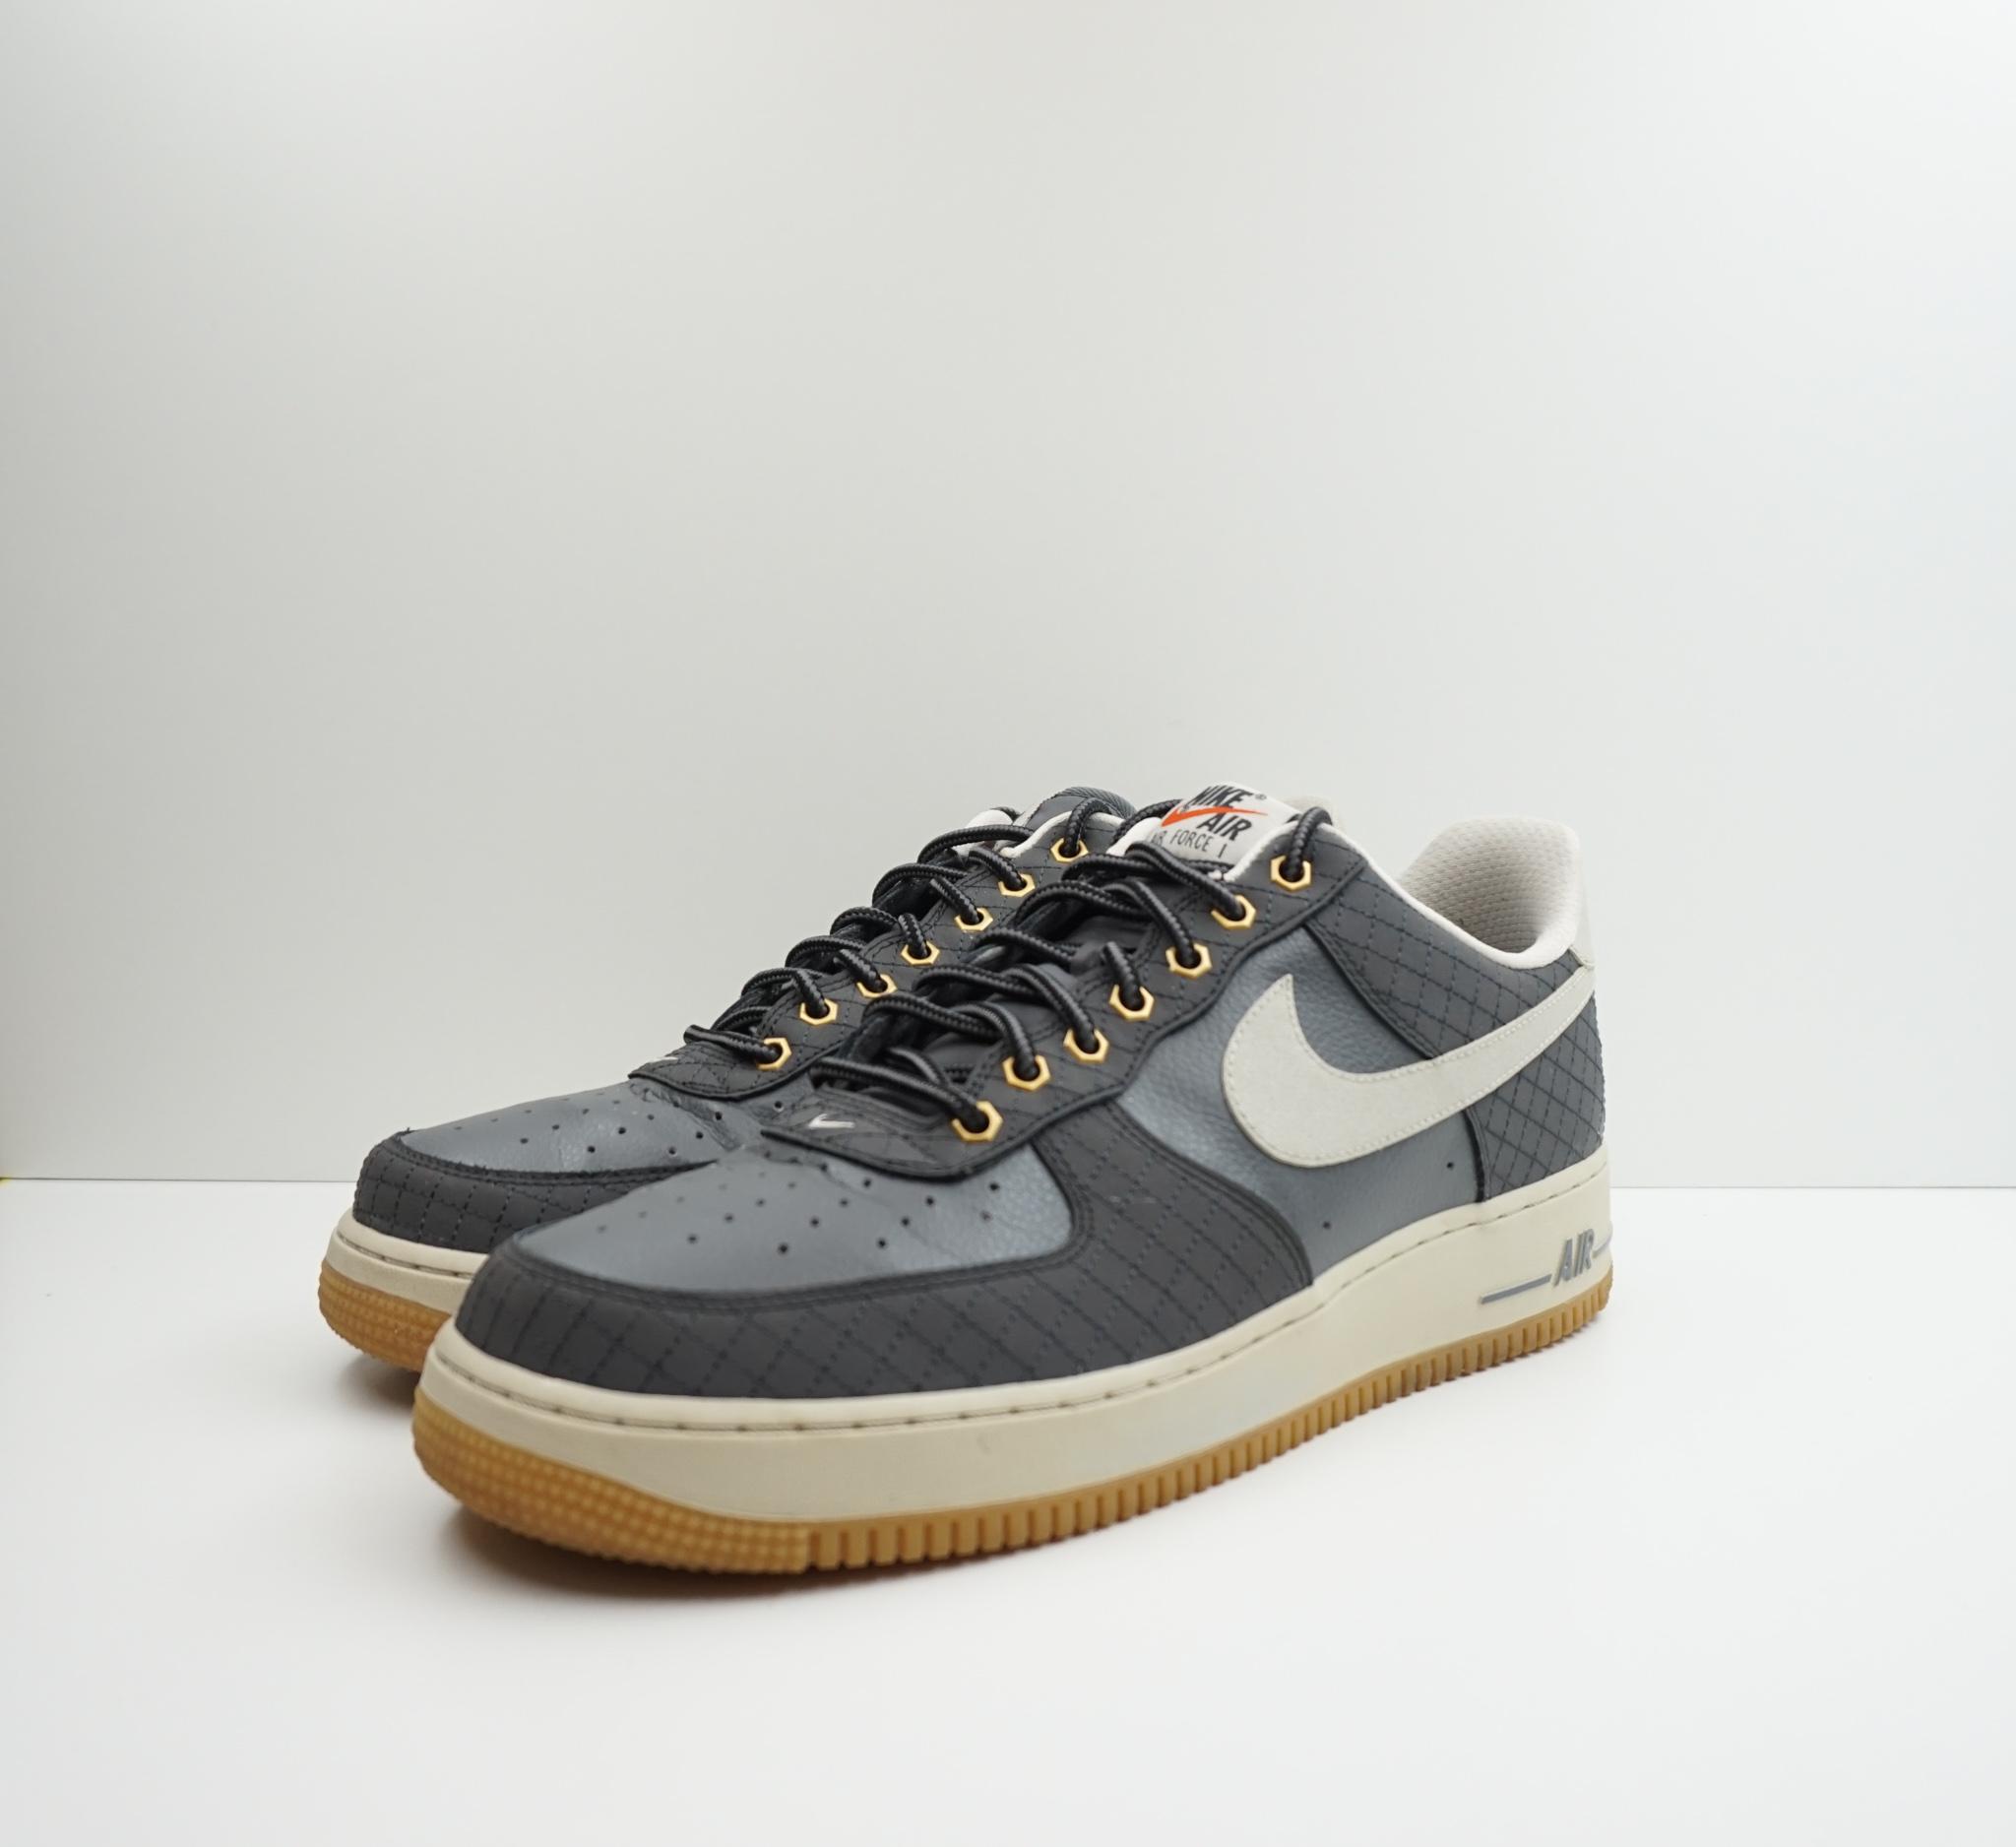 Nike Air Force 1 Low Dark Grey Light Bone Gum